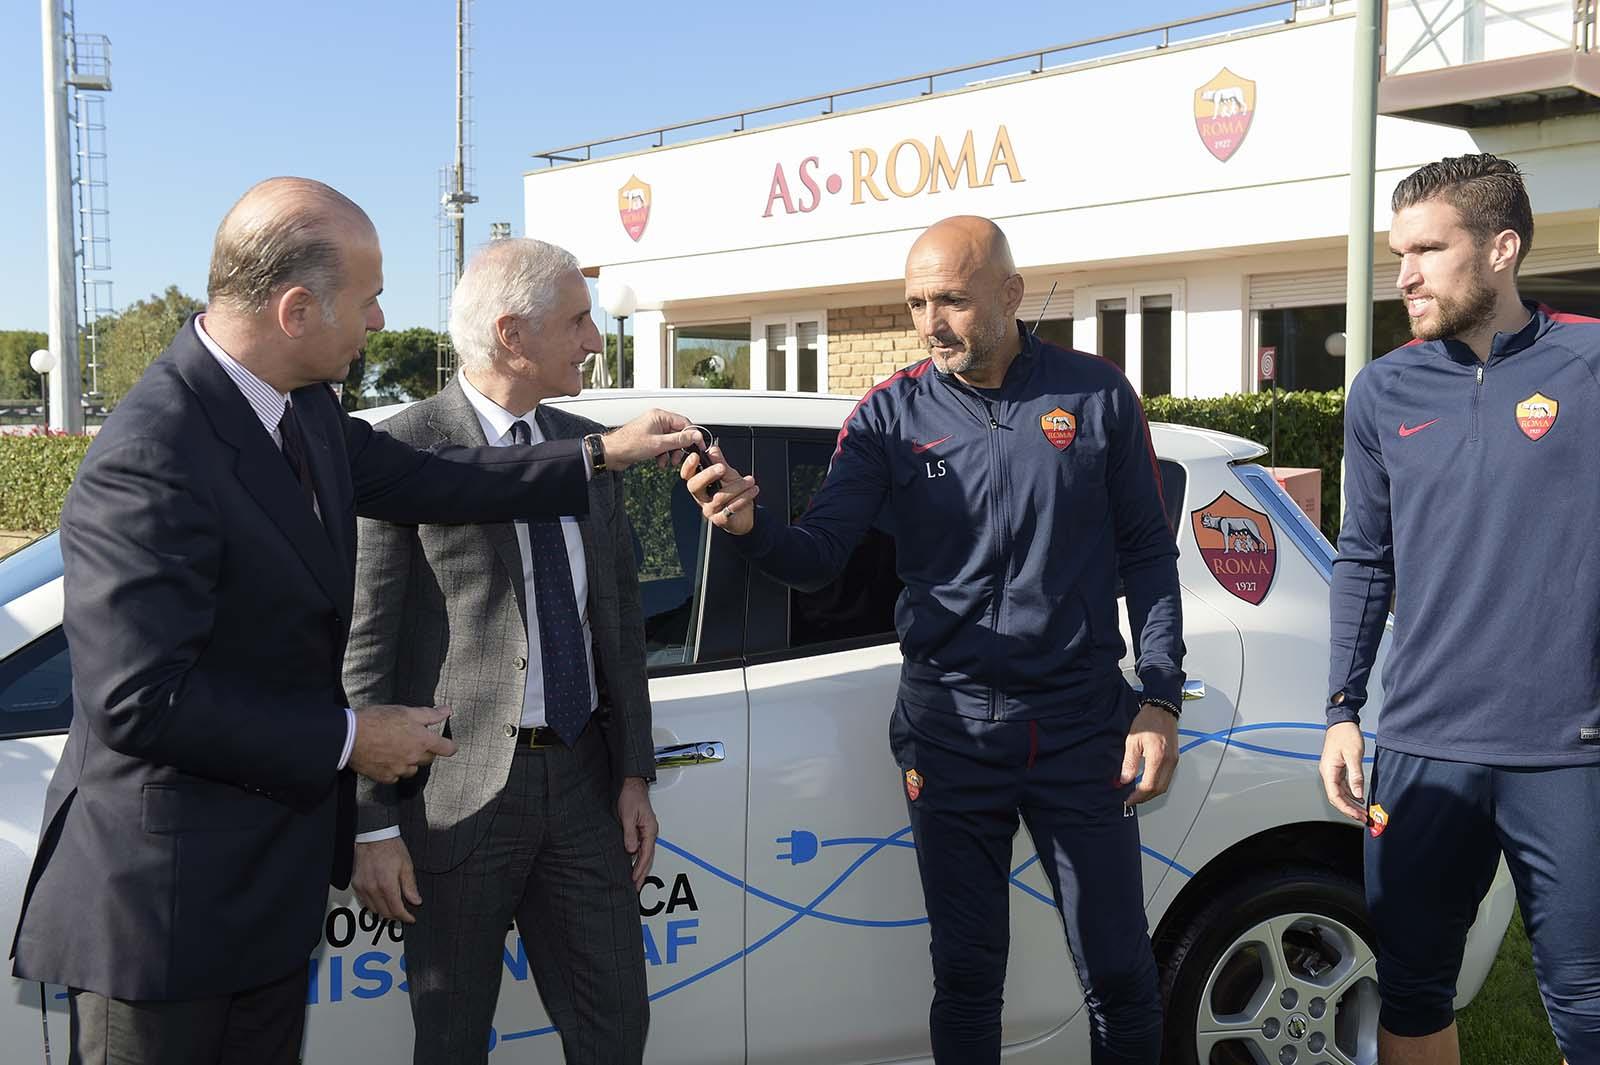 as-roma-nissan-sponsoring-electrique